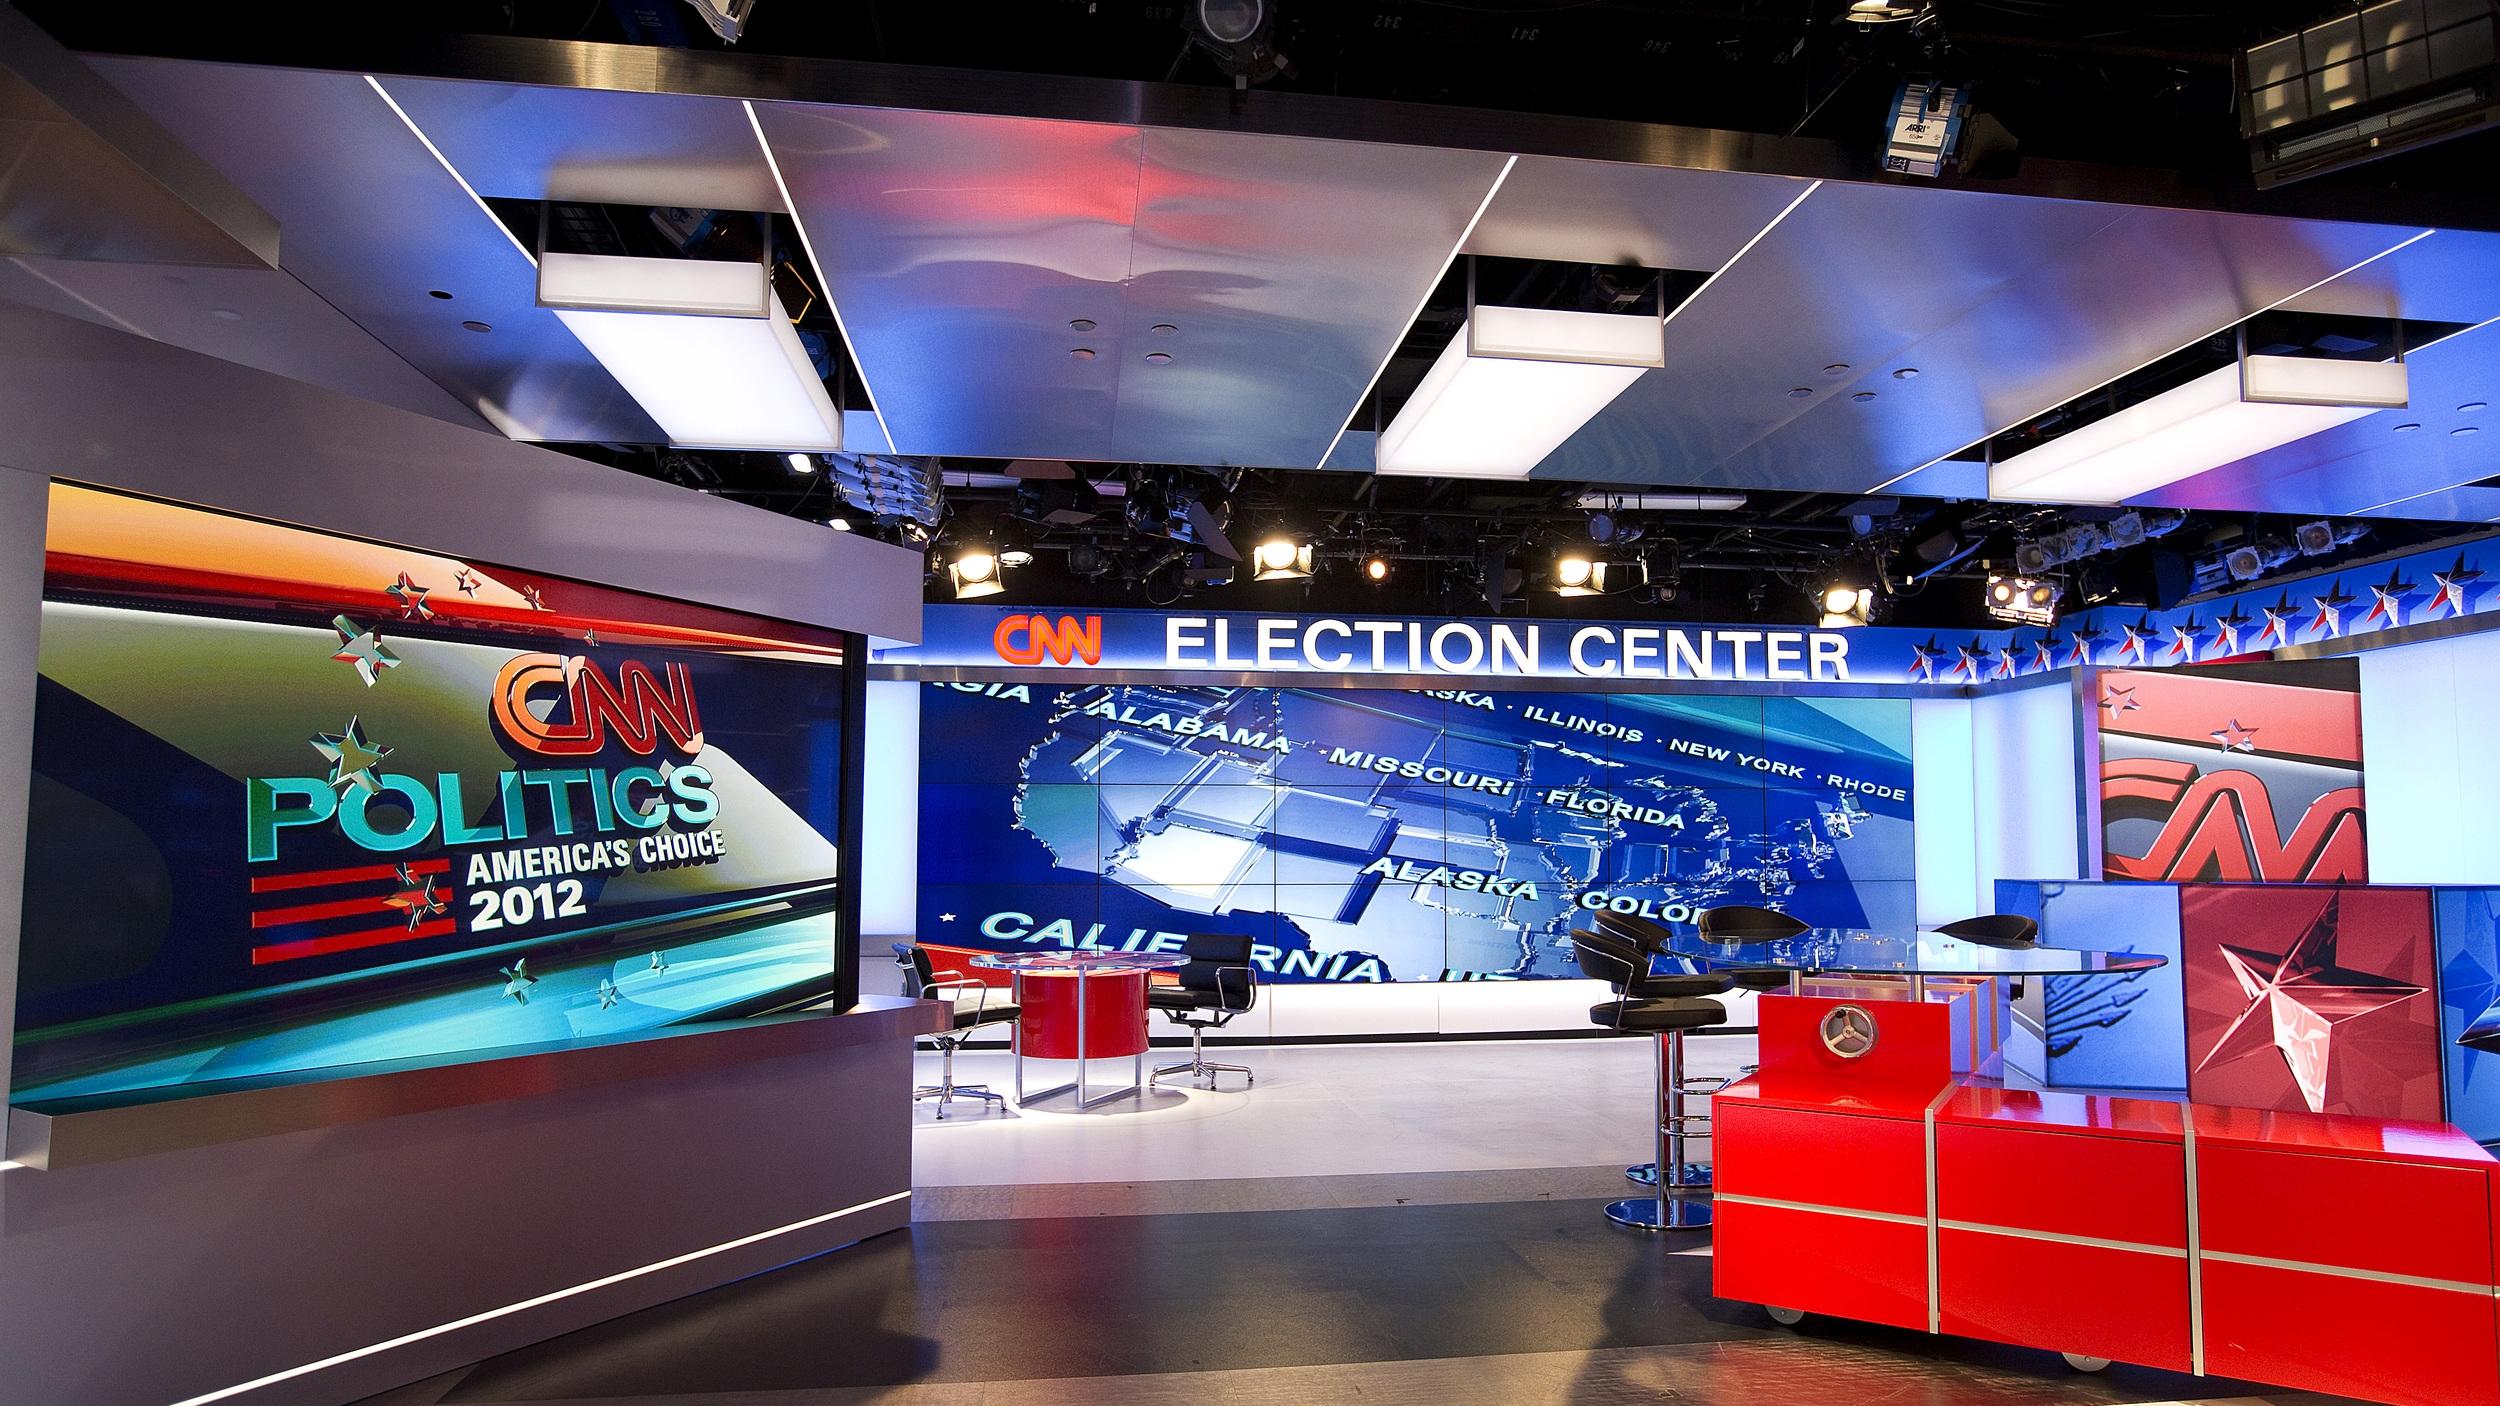 cnn_wdc_election_center14.JPG